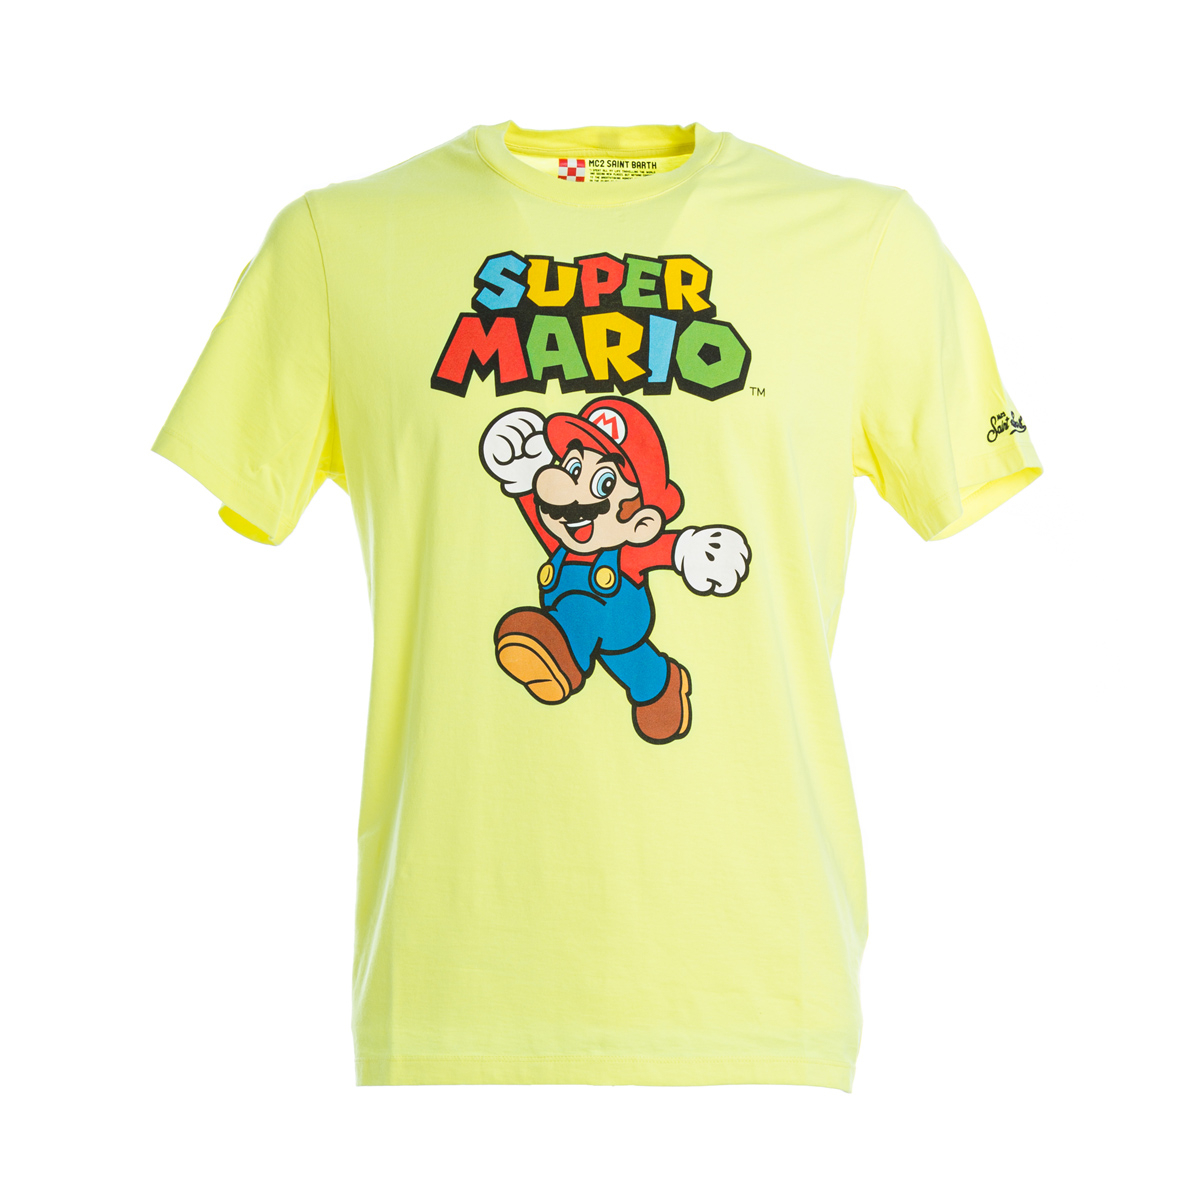 T-Shirt St. Bart Super Mario Limited Edition